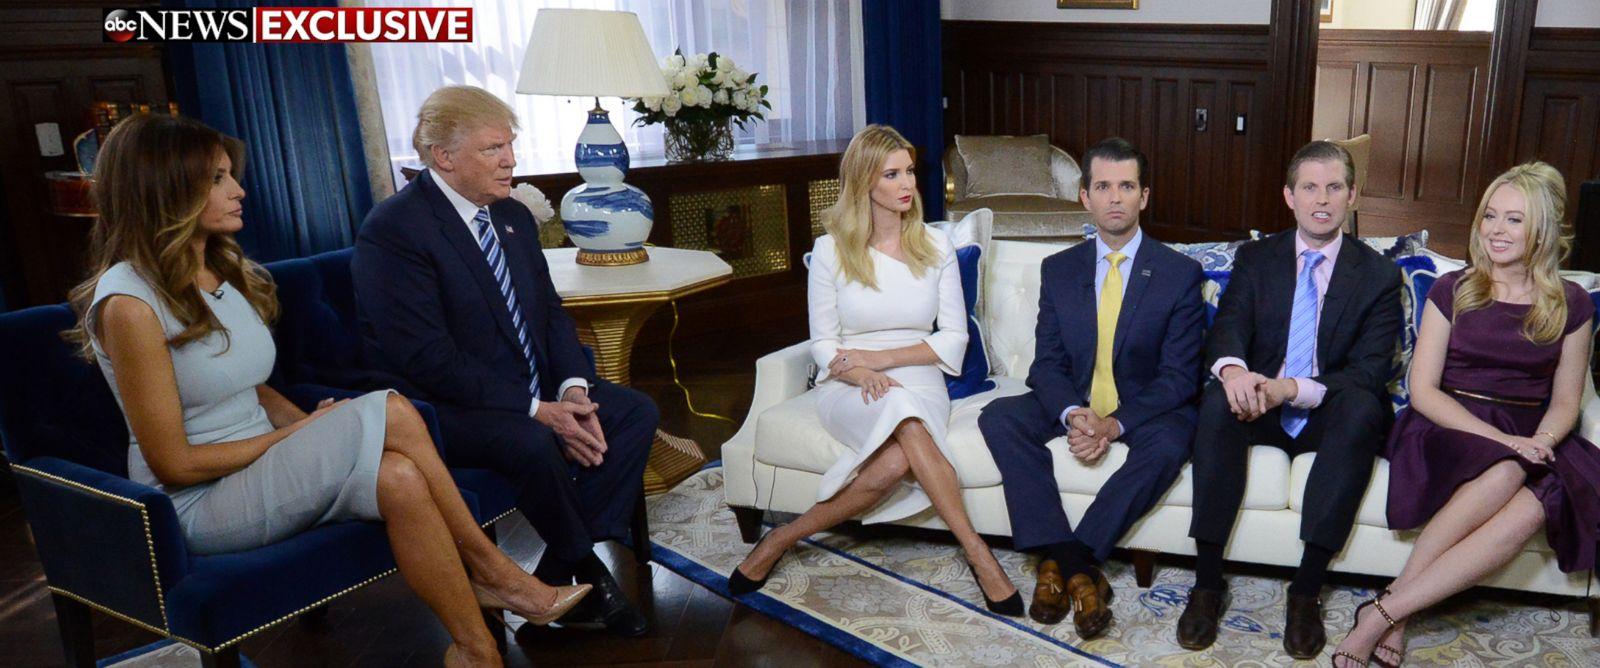 Transcript: George Stephanopoulos Interviews Trump Family - ABC News